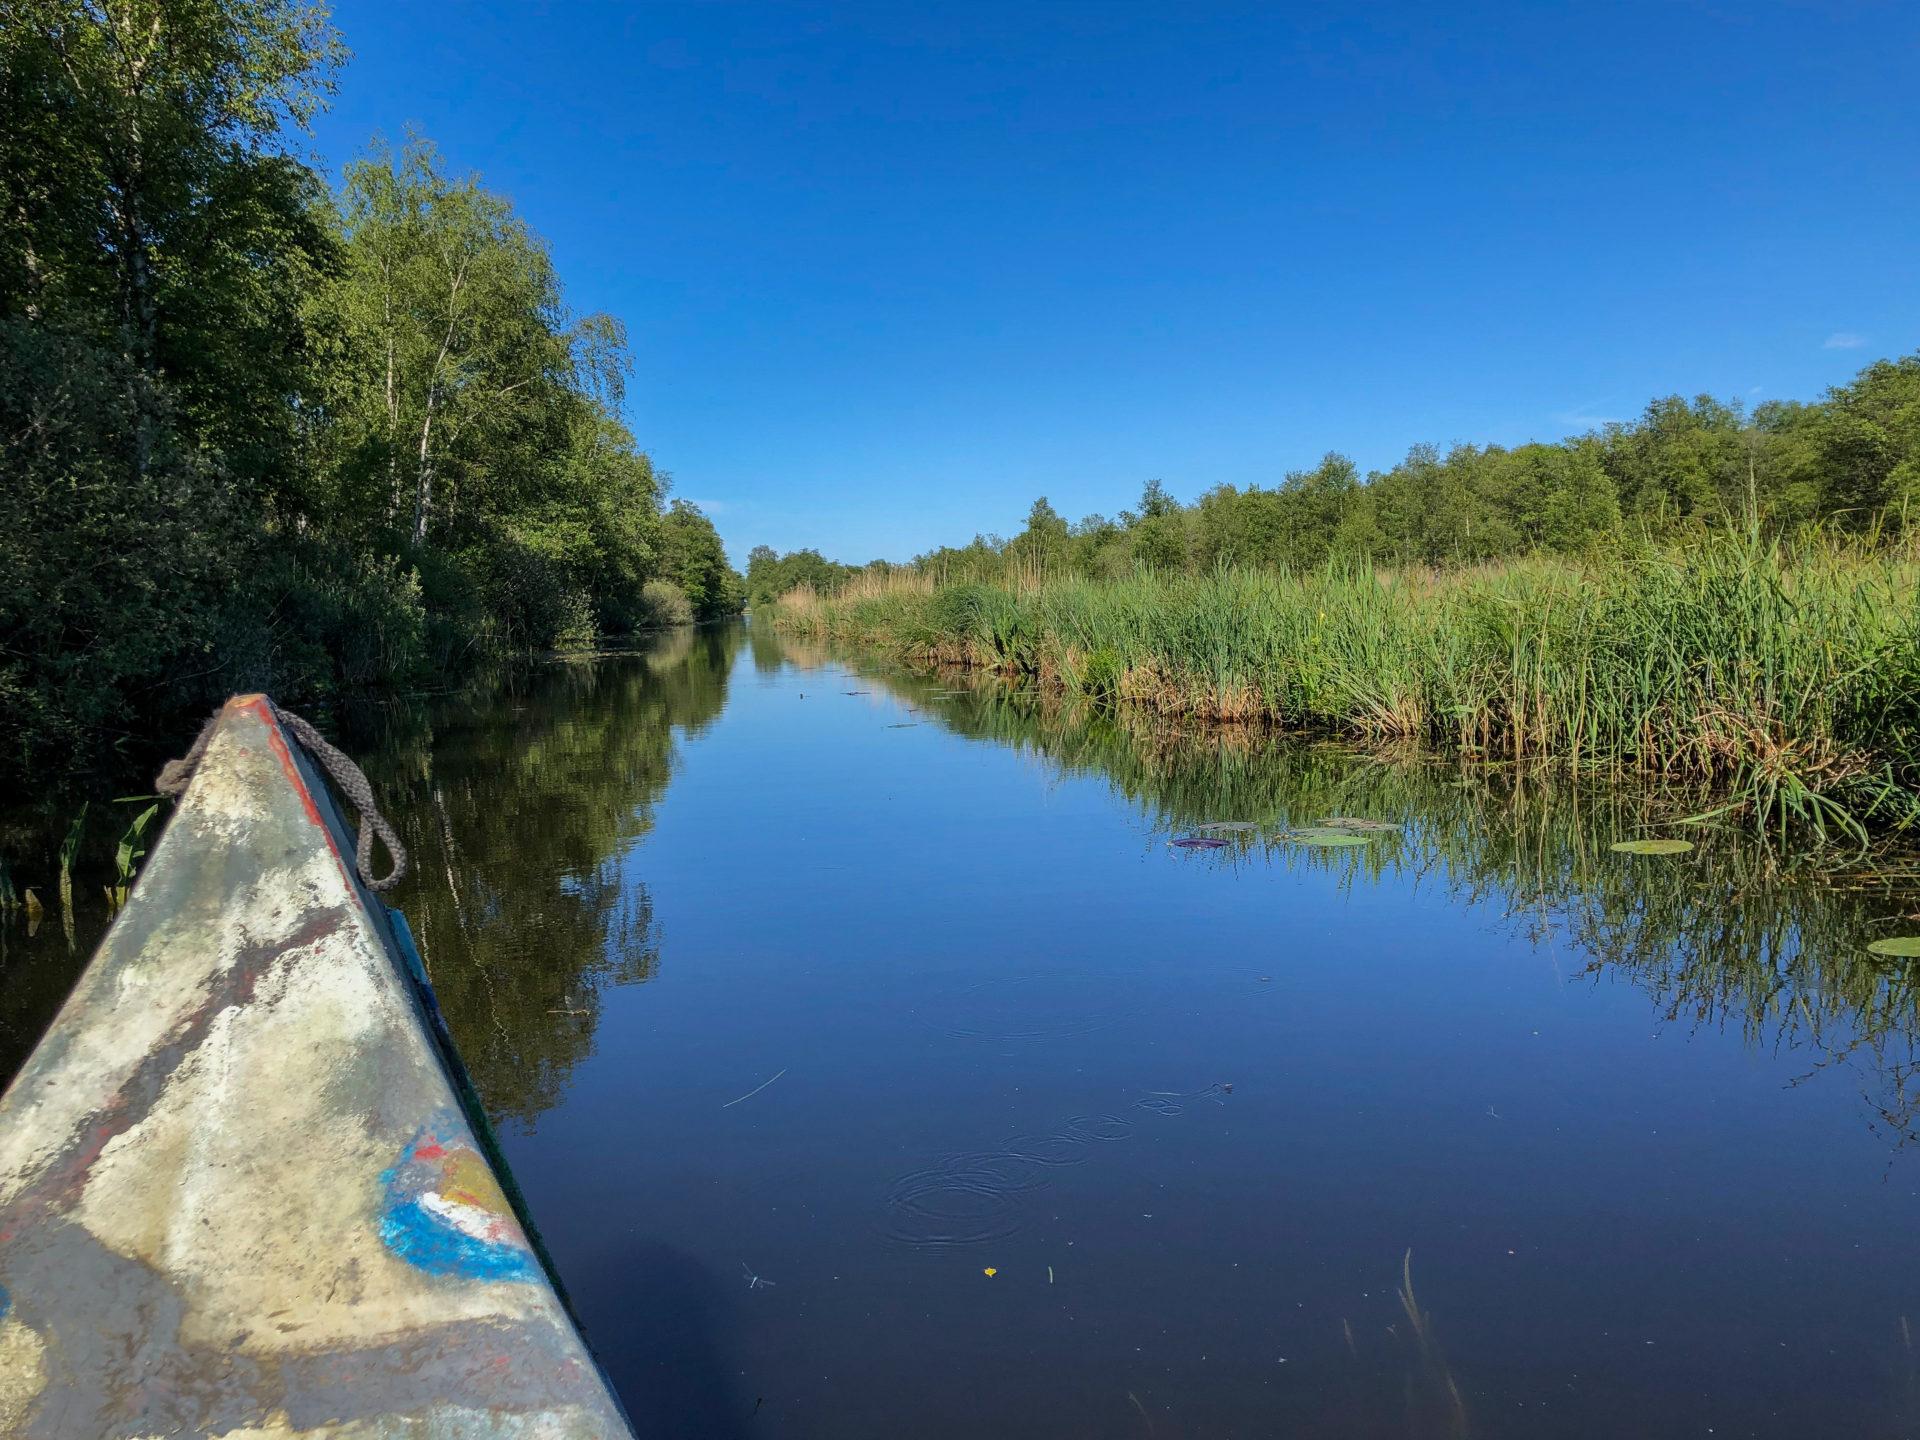 Kanutour durch den Nationalpark Weerribben-Wieden in der Provinz Overijssel in den Niederlanden